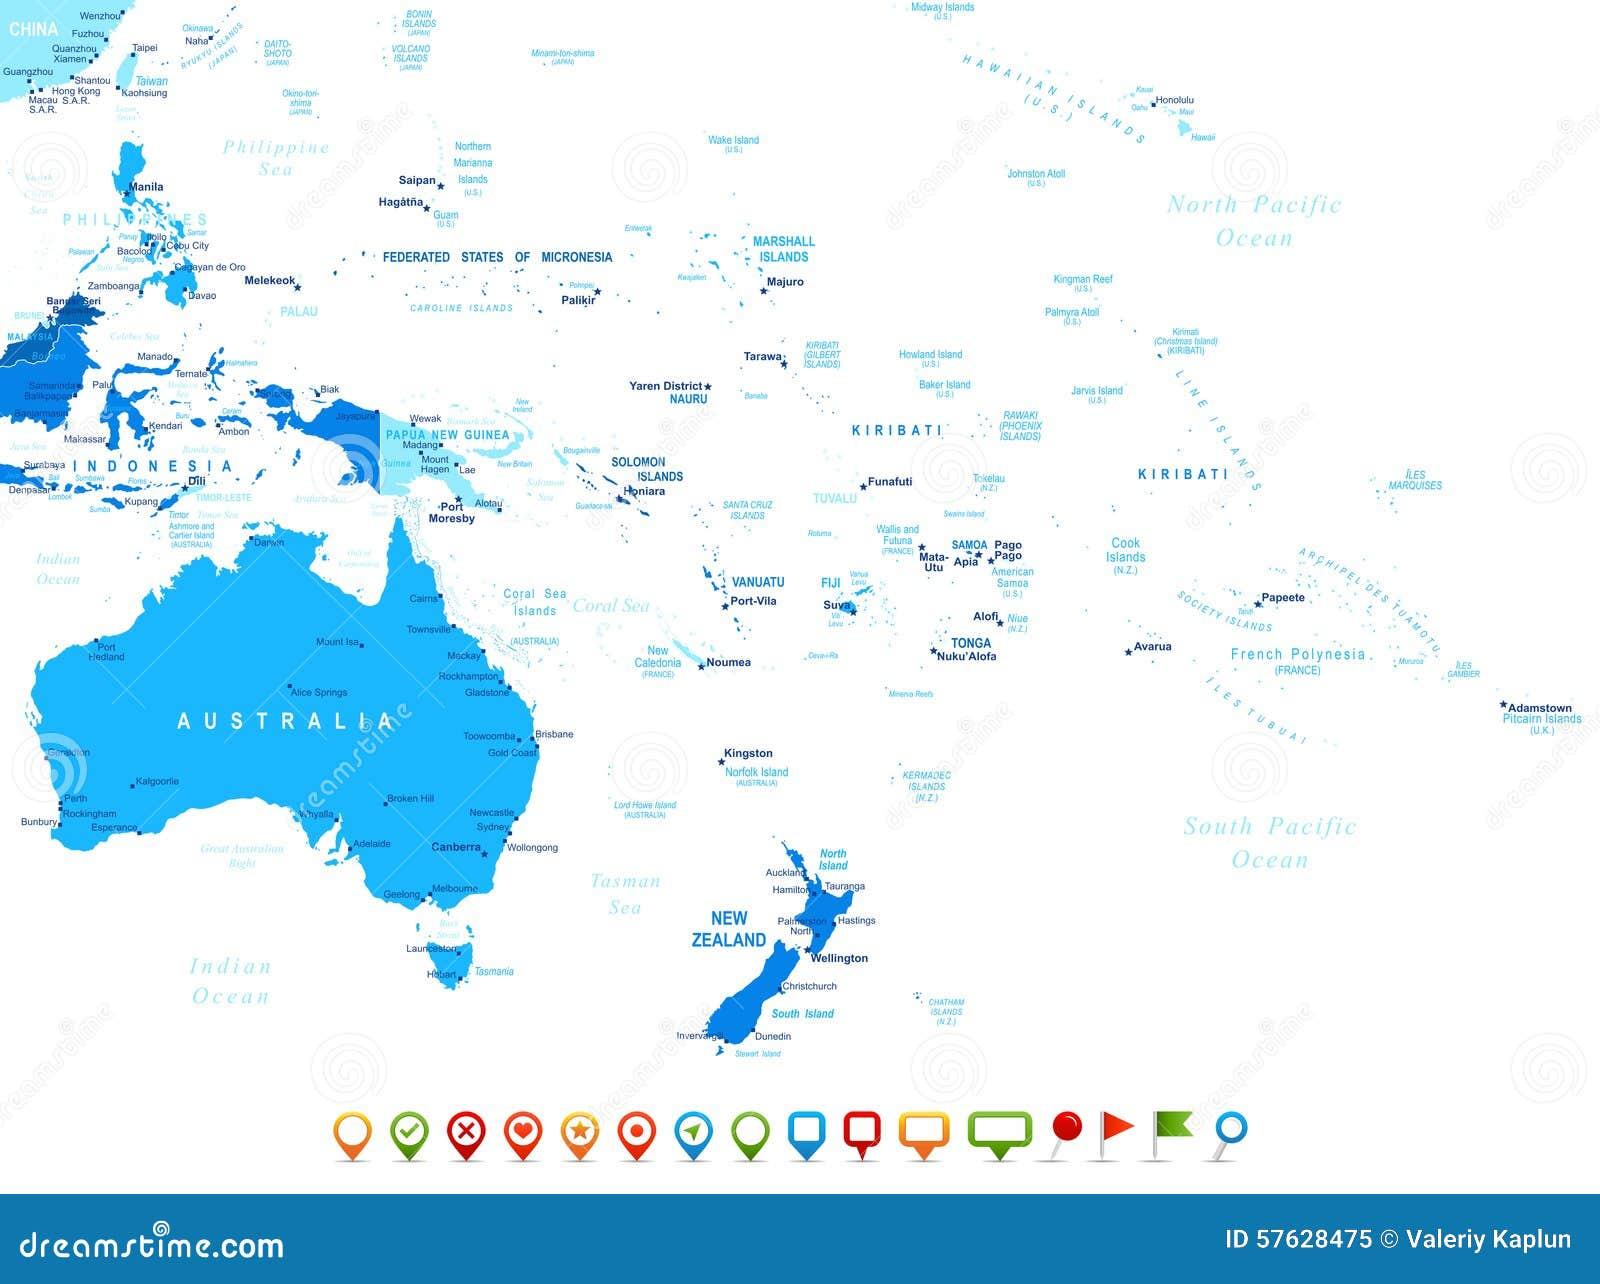 History of Oceania